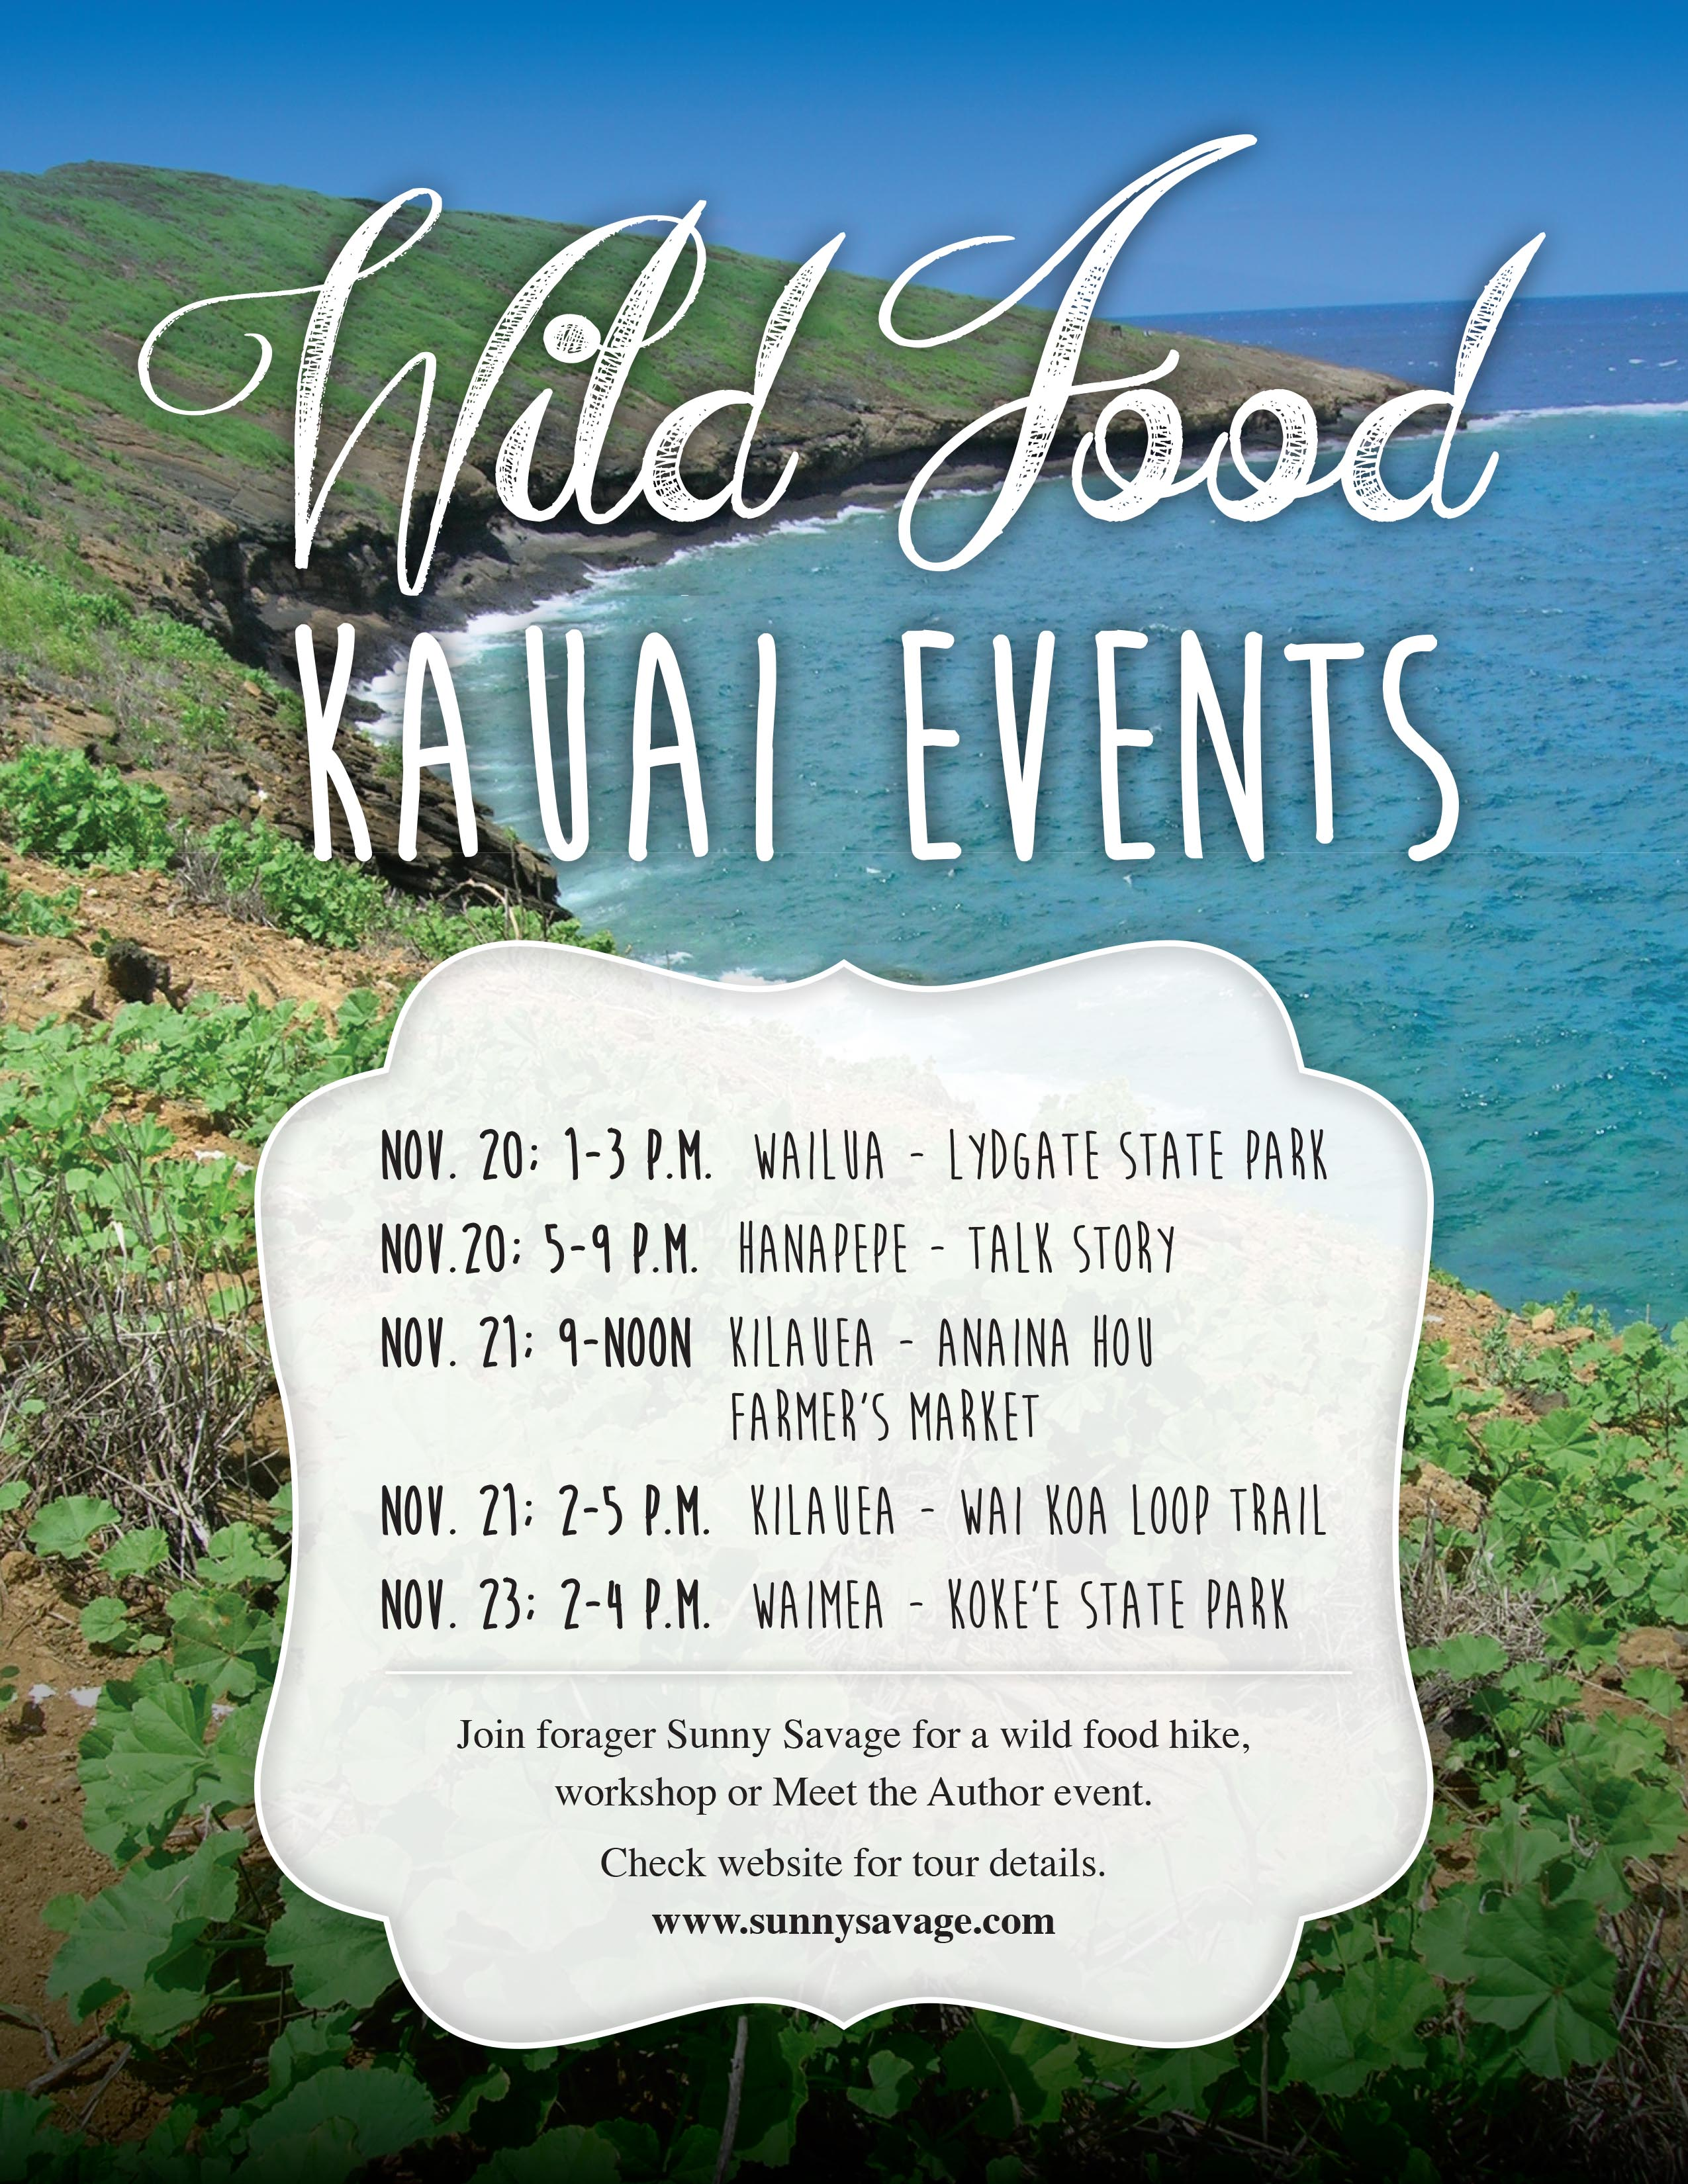 Kauai Wild Food Plants of Hawaii tour